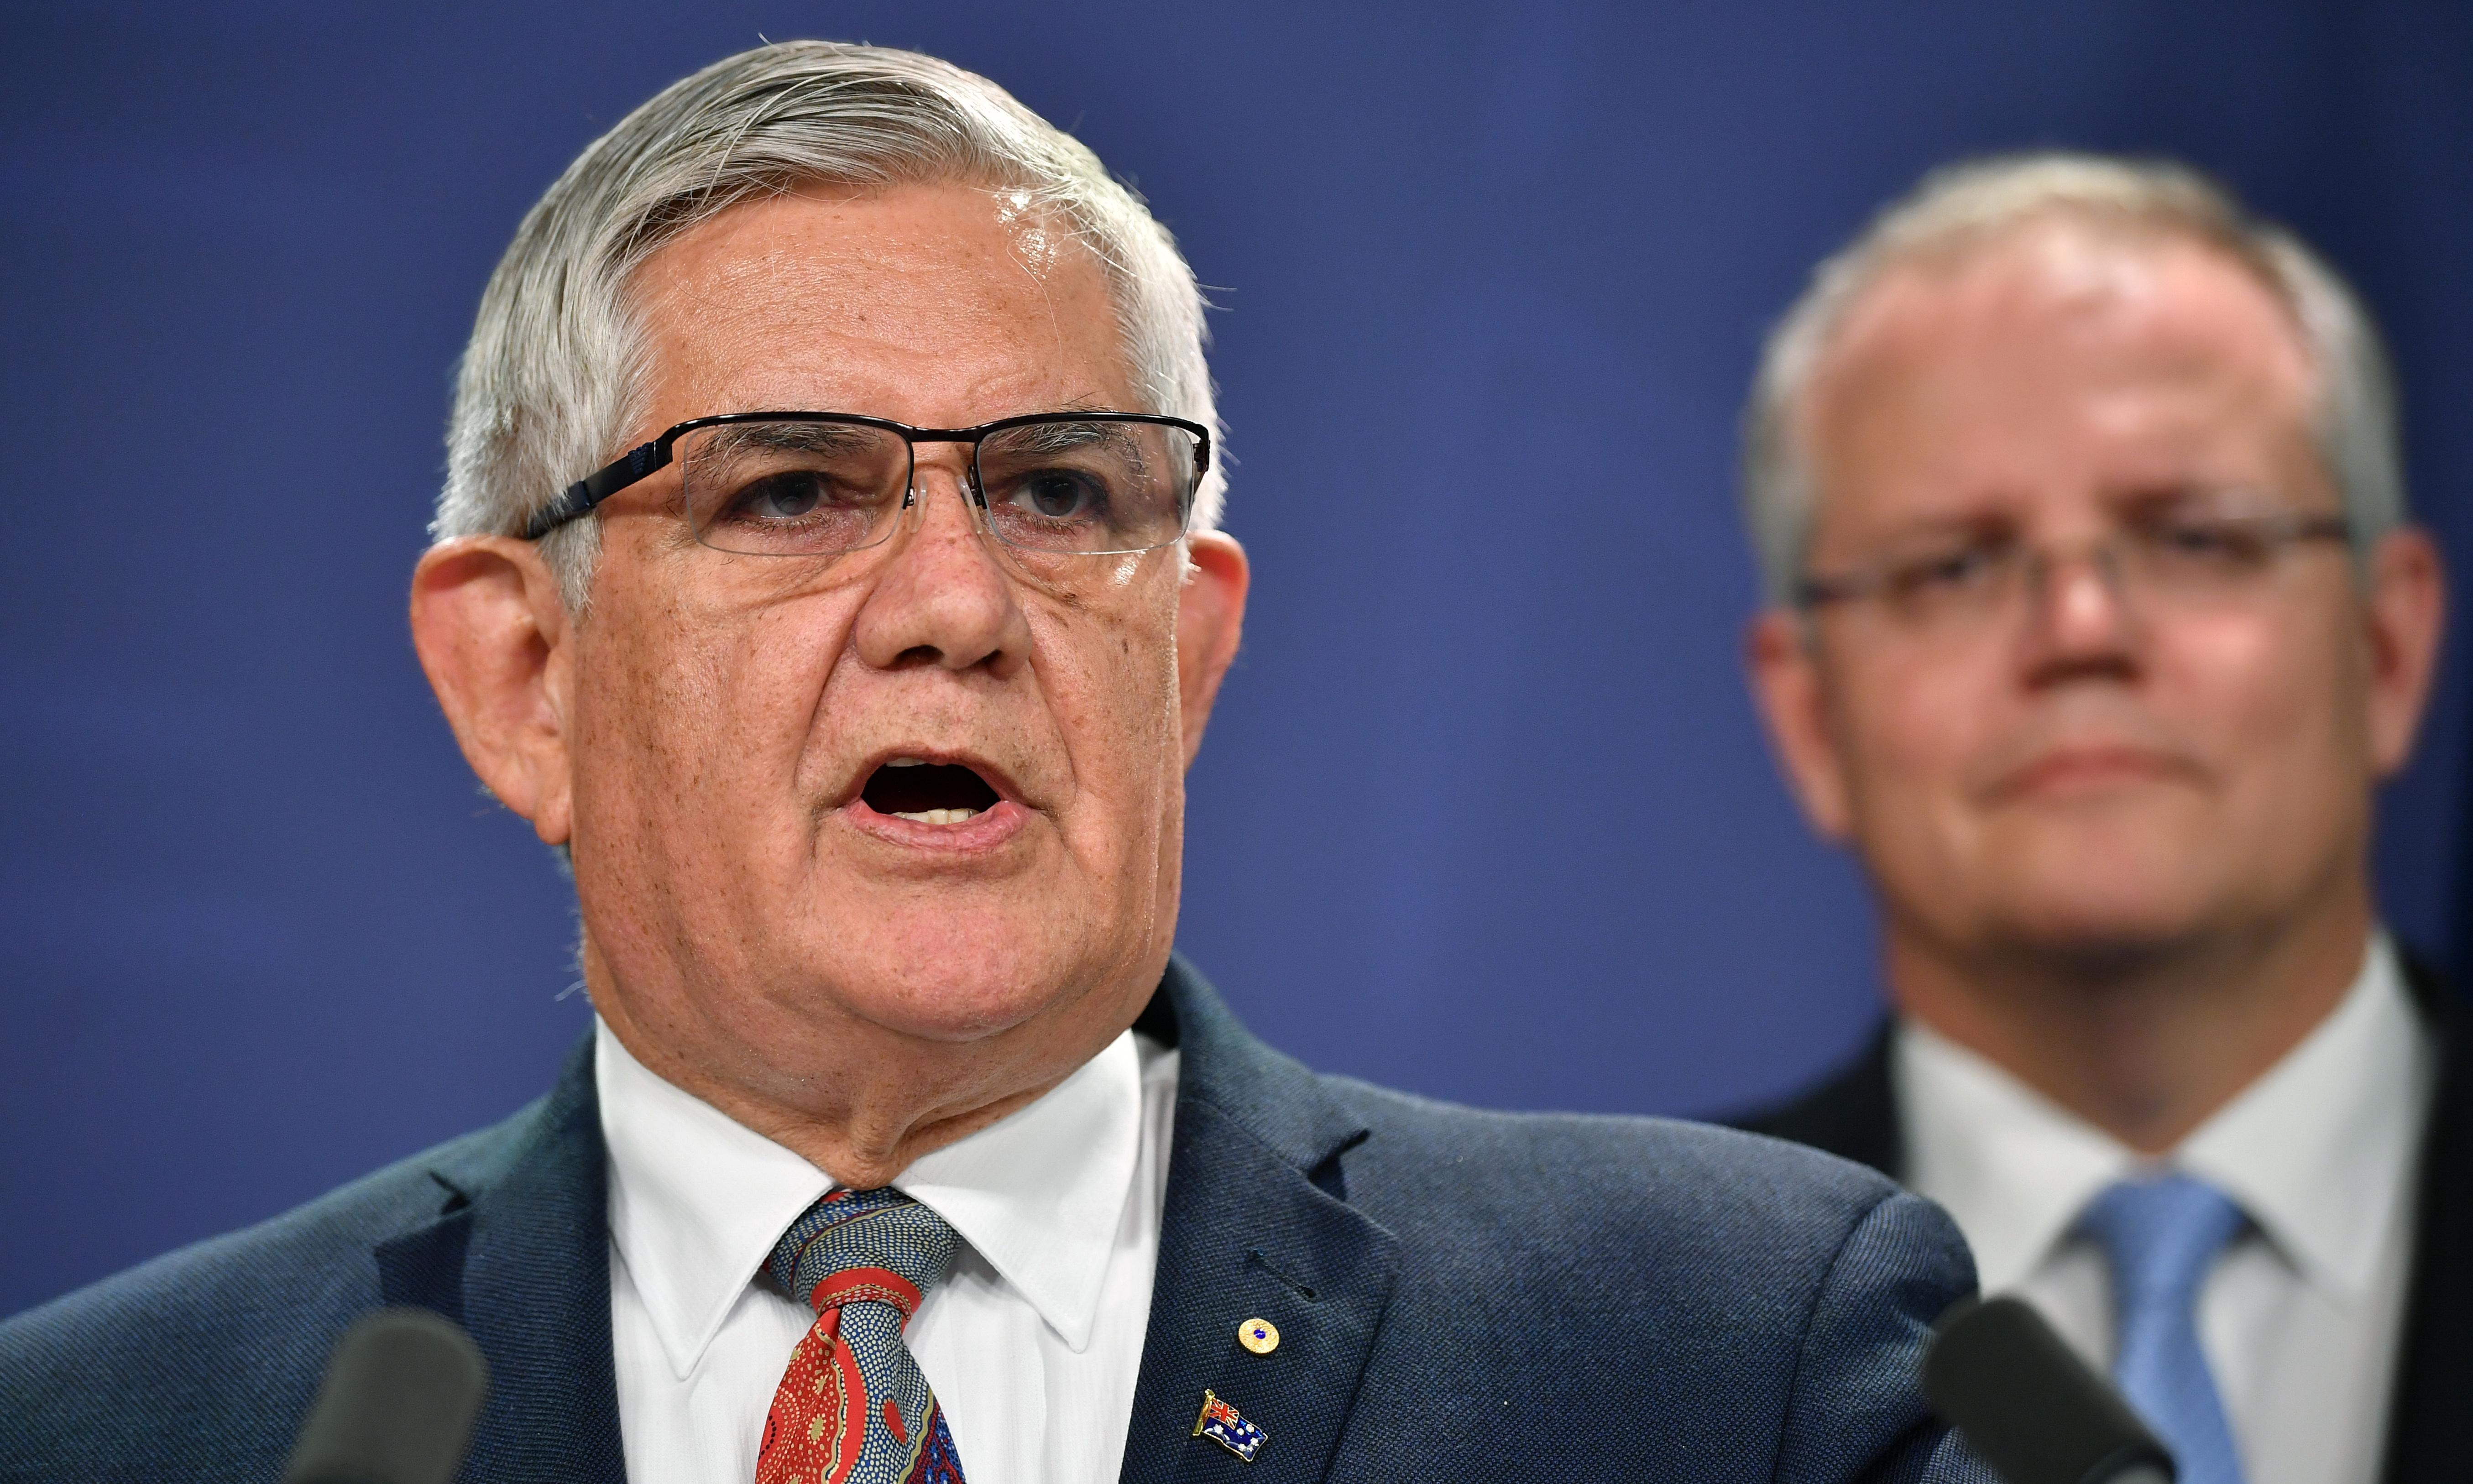 Aboriginal groups welcome Ken Wyatt as minister for Indigenous Australians